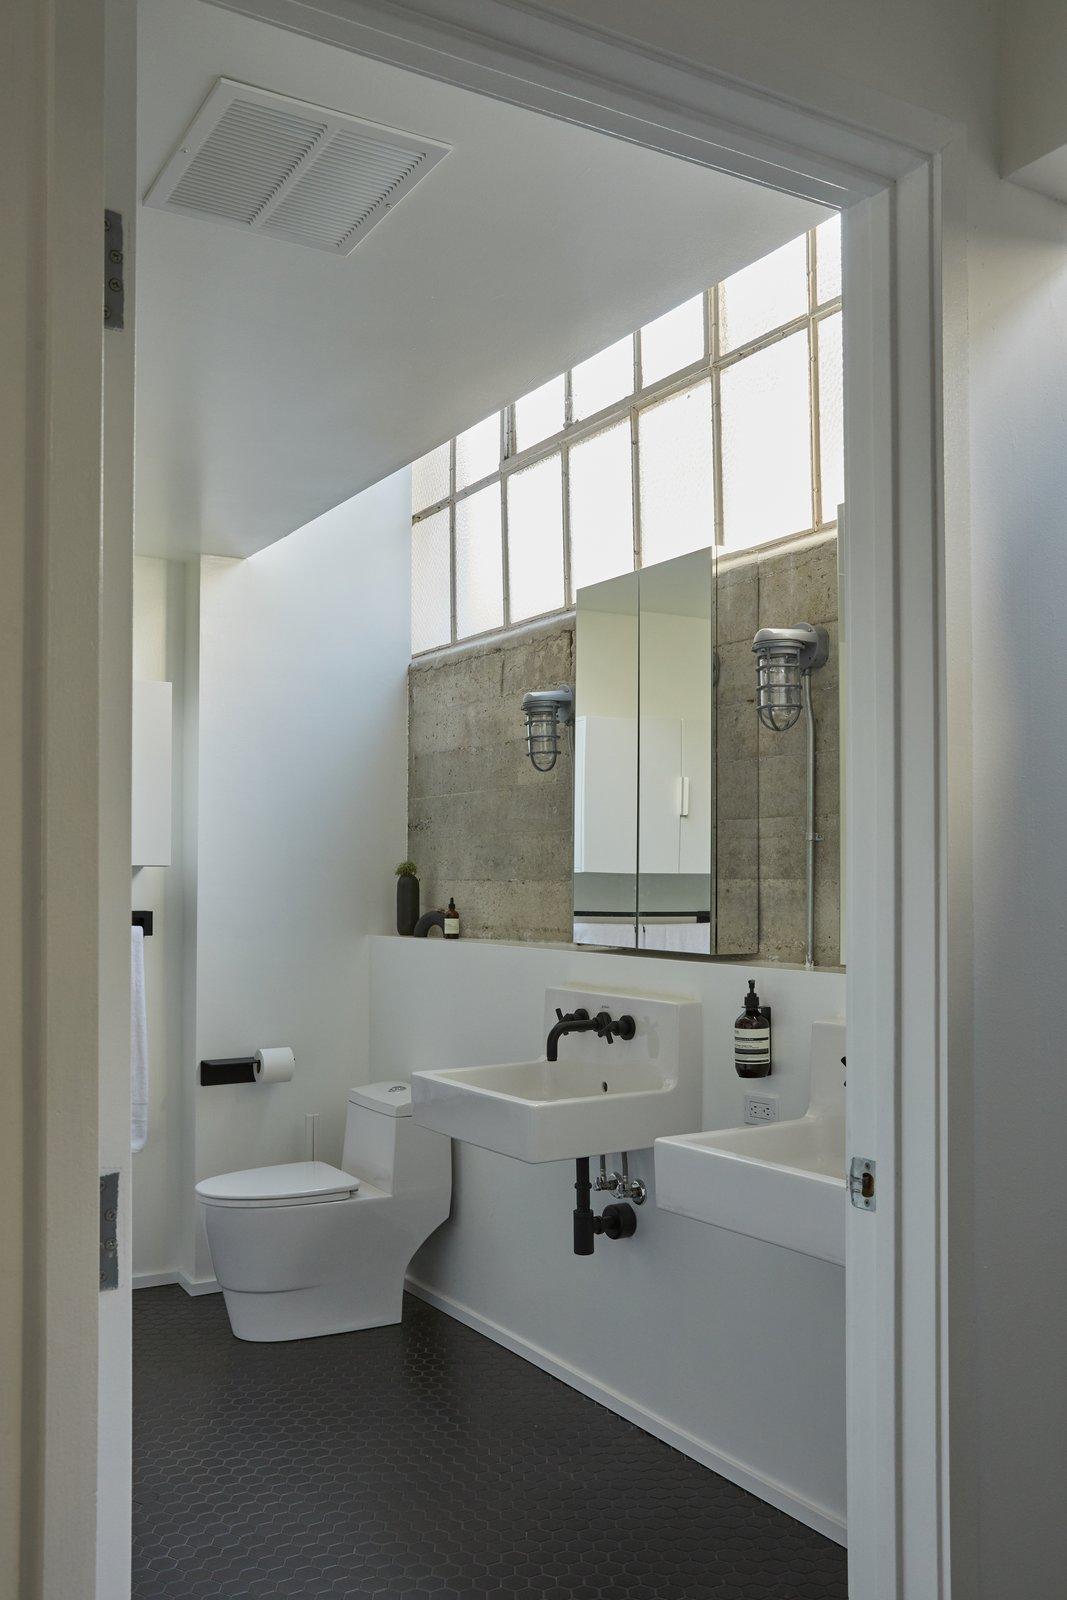 Walker Building Loft bathroom